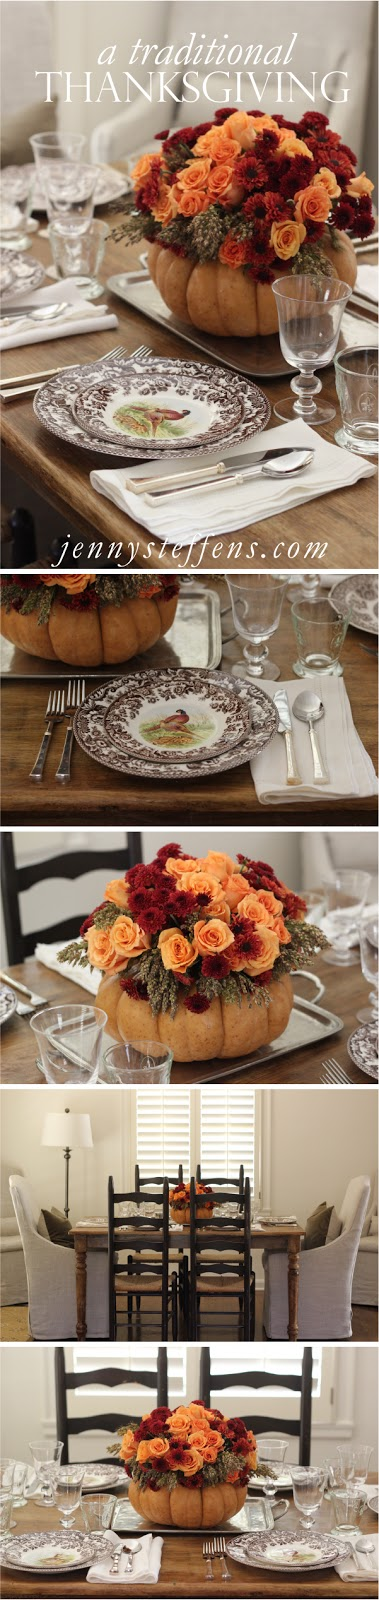 Jenny Steffens Hobick: Thanksgiving Table Setting | DIY Flower ...